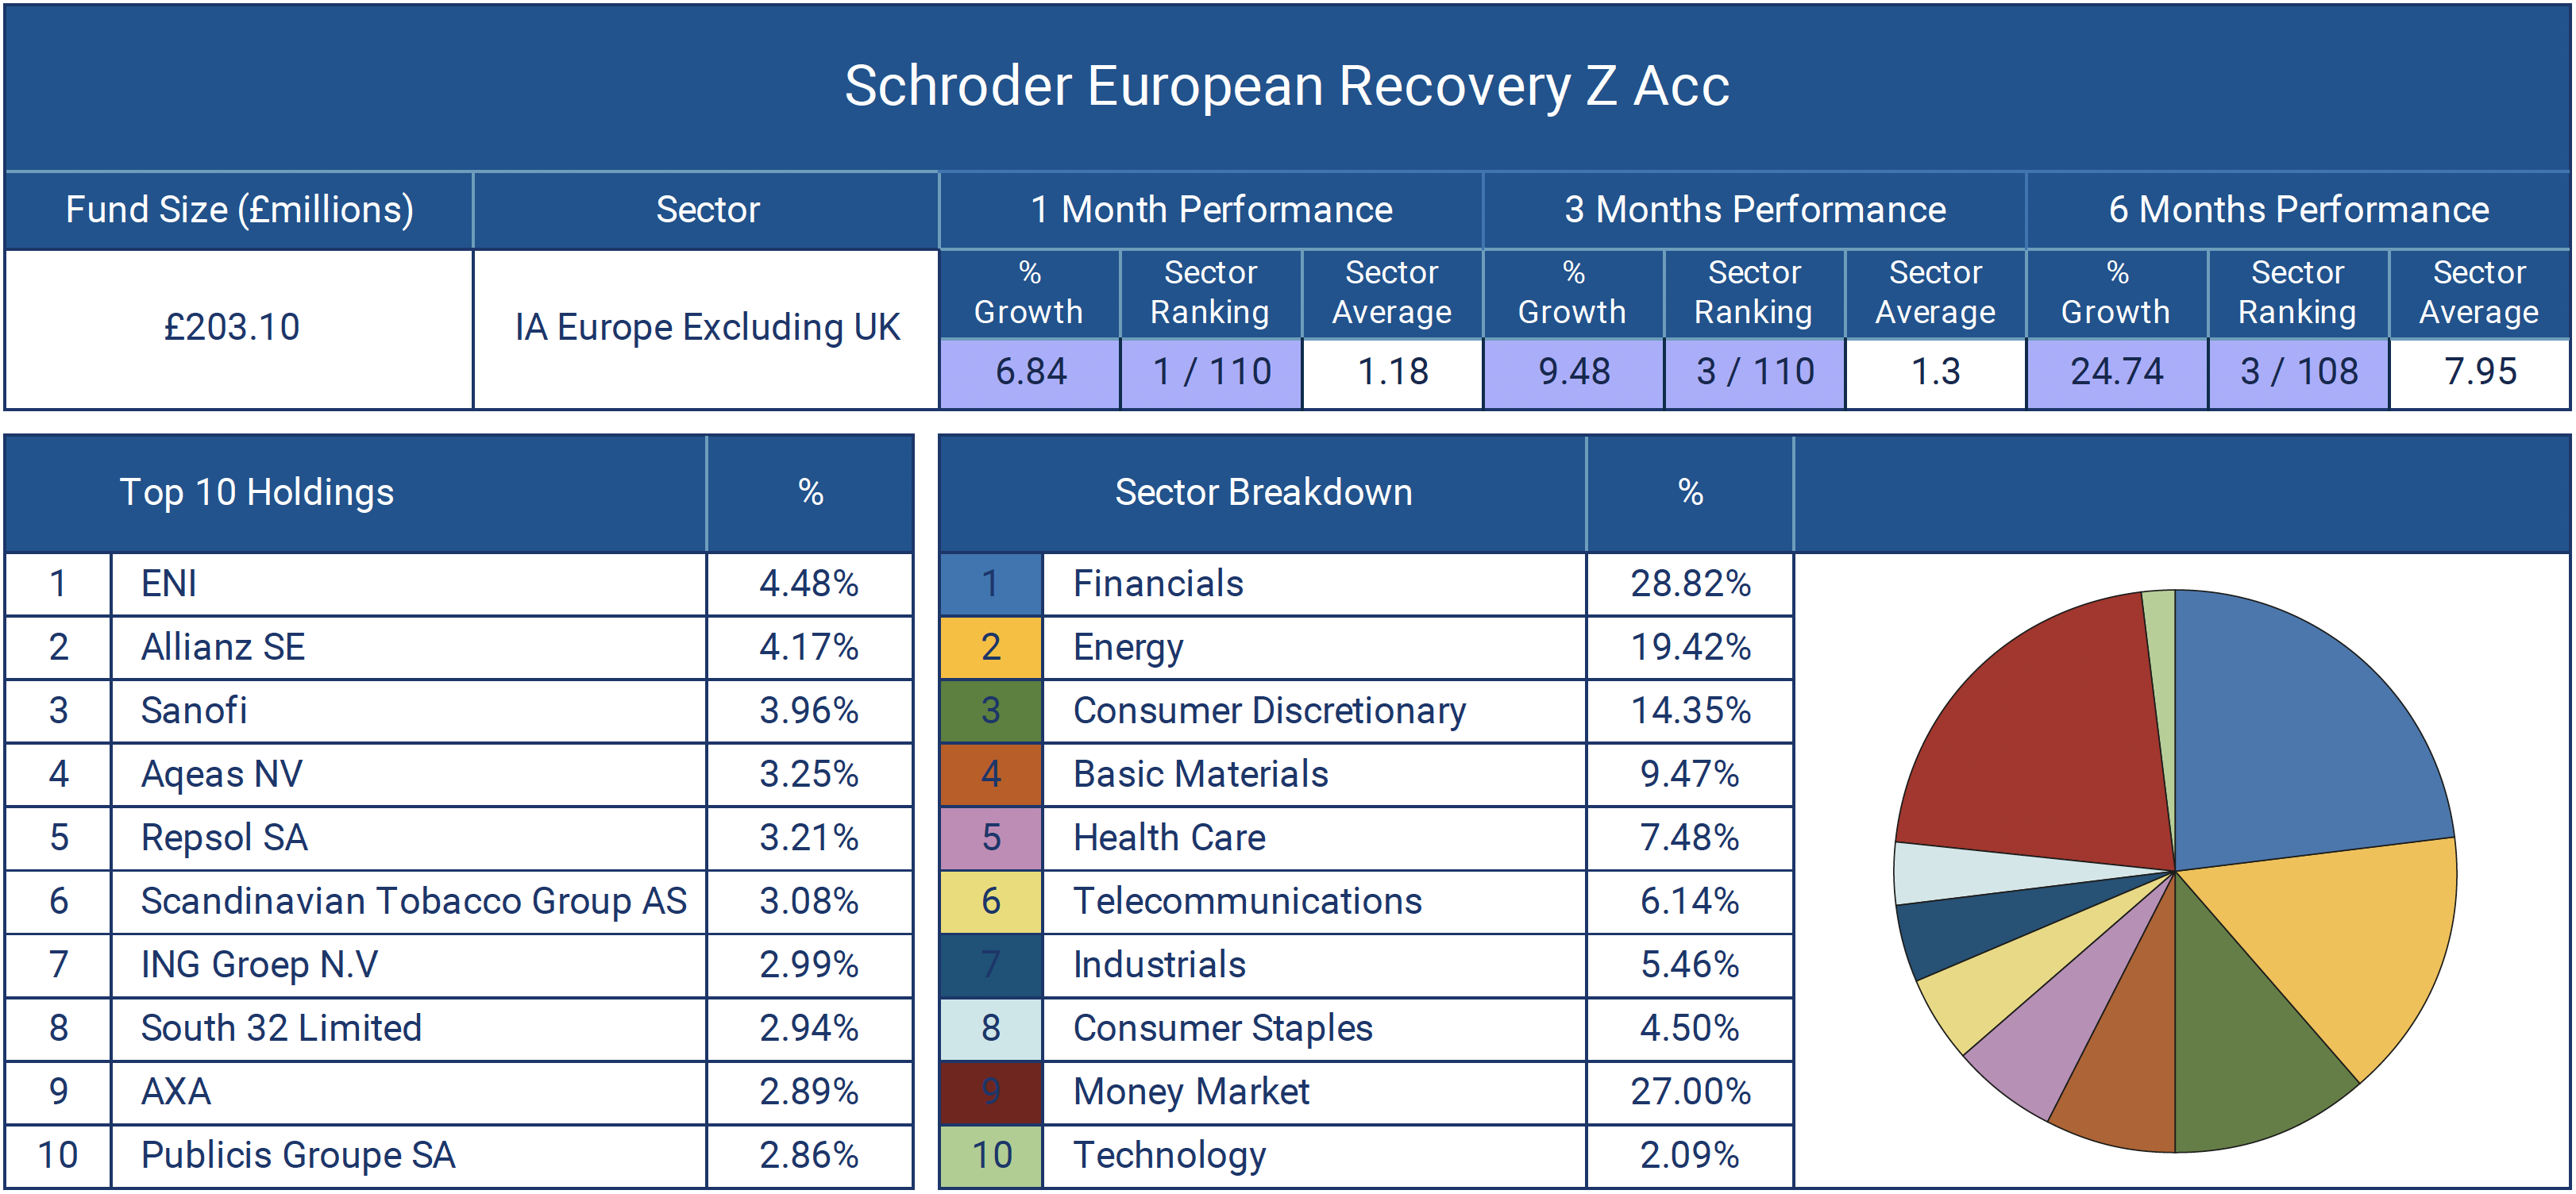 Schroder European Recovery